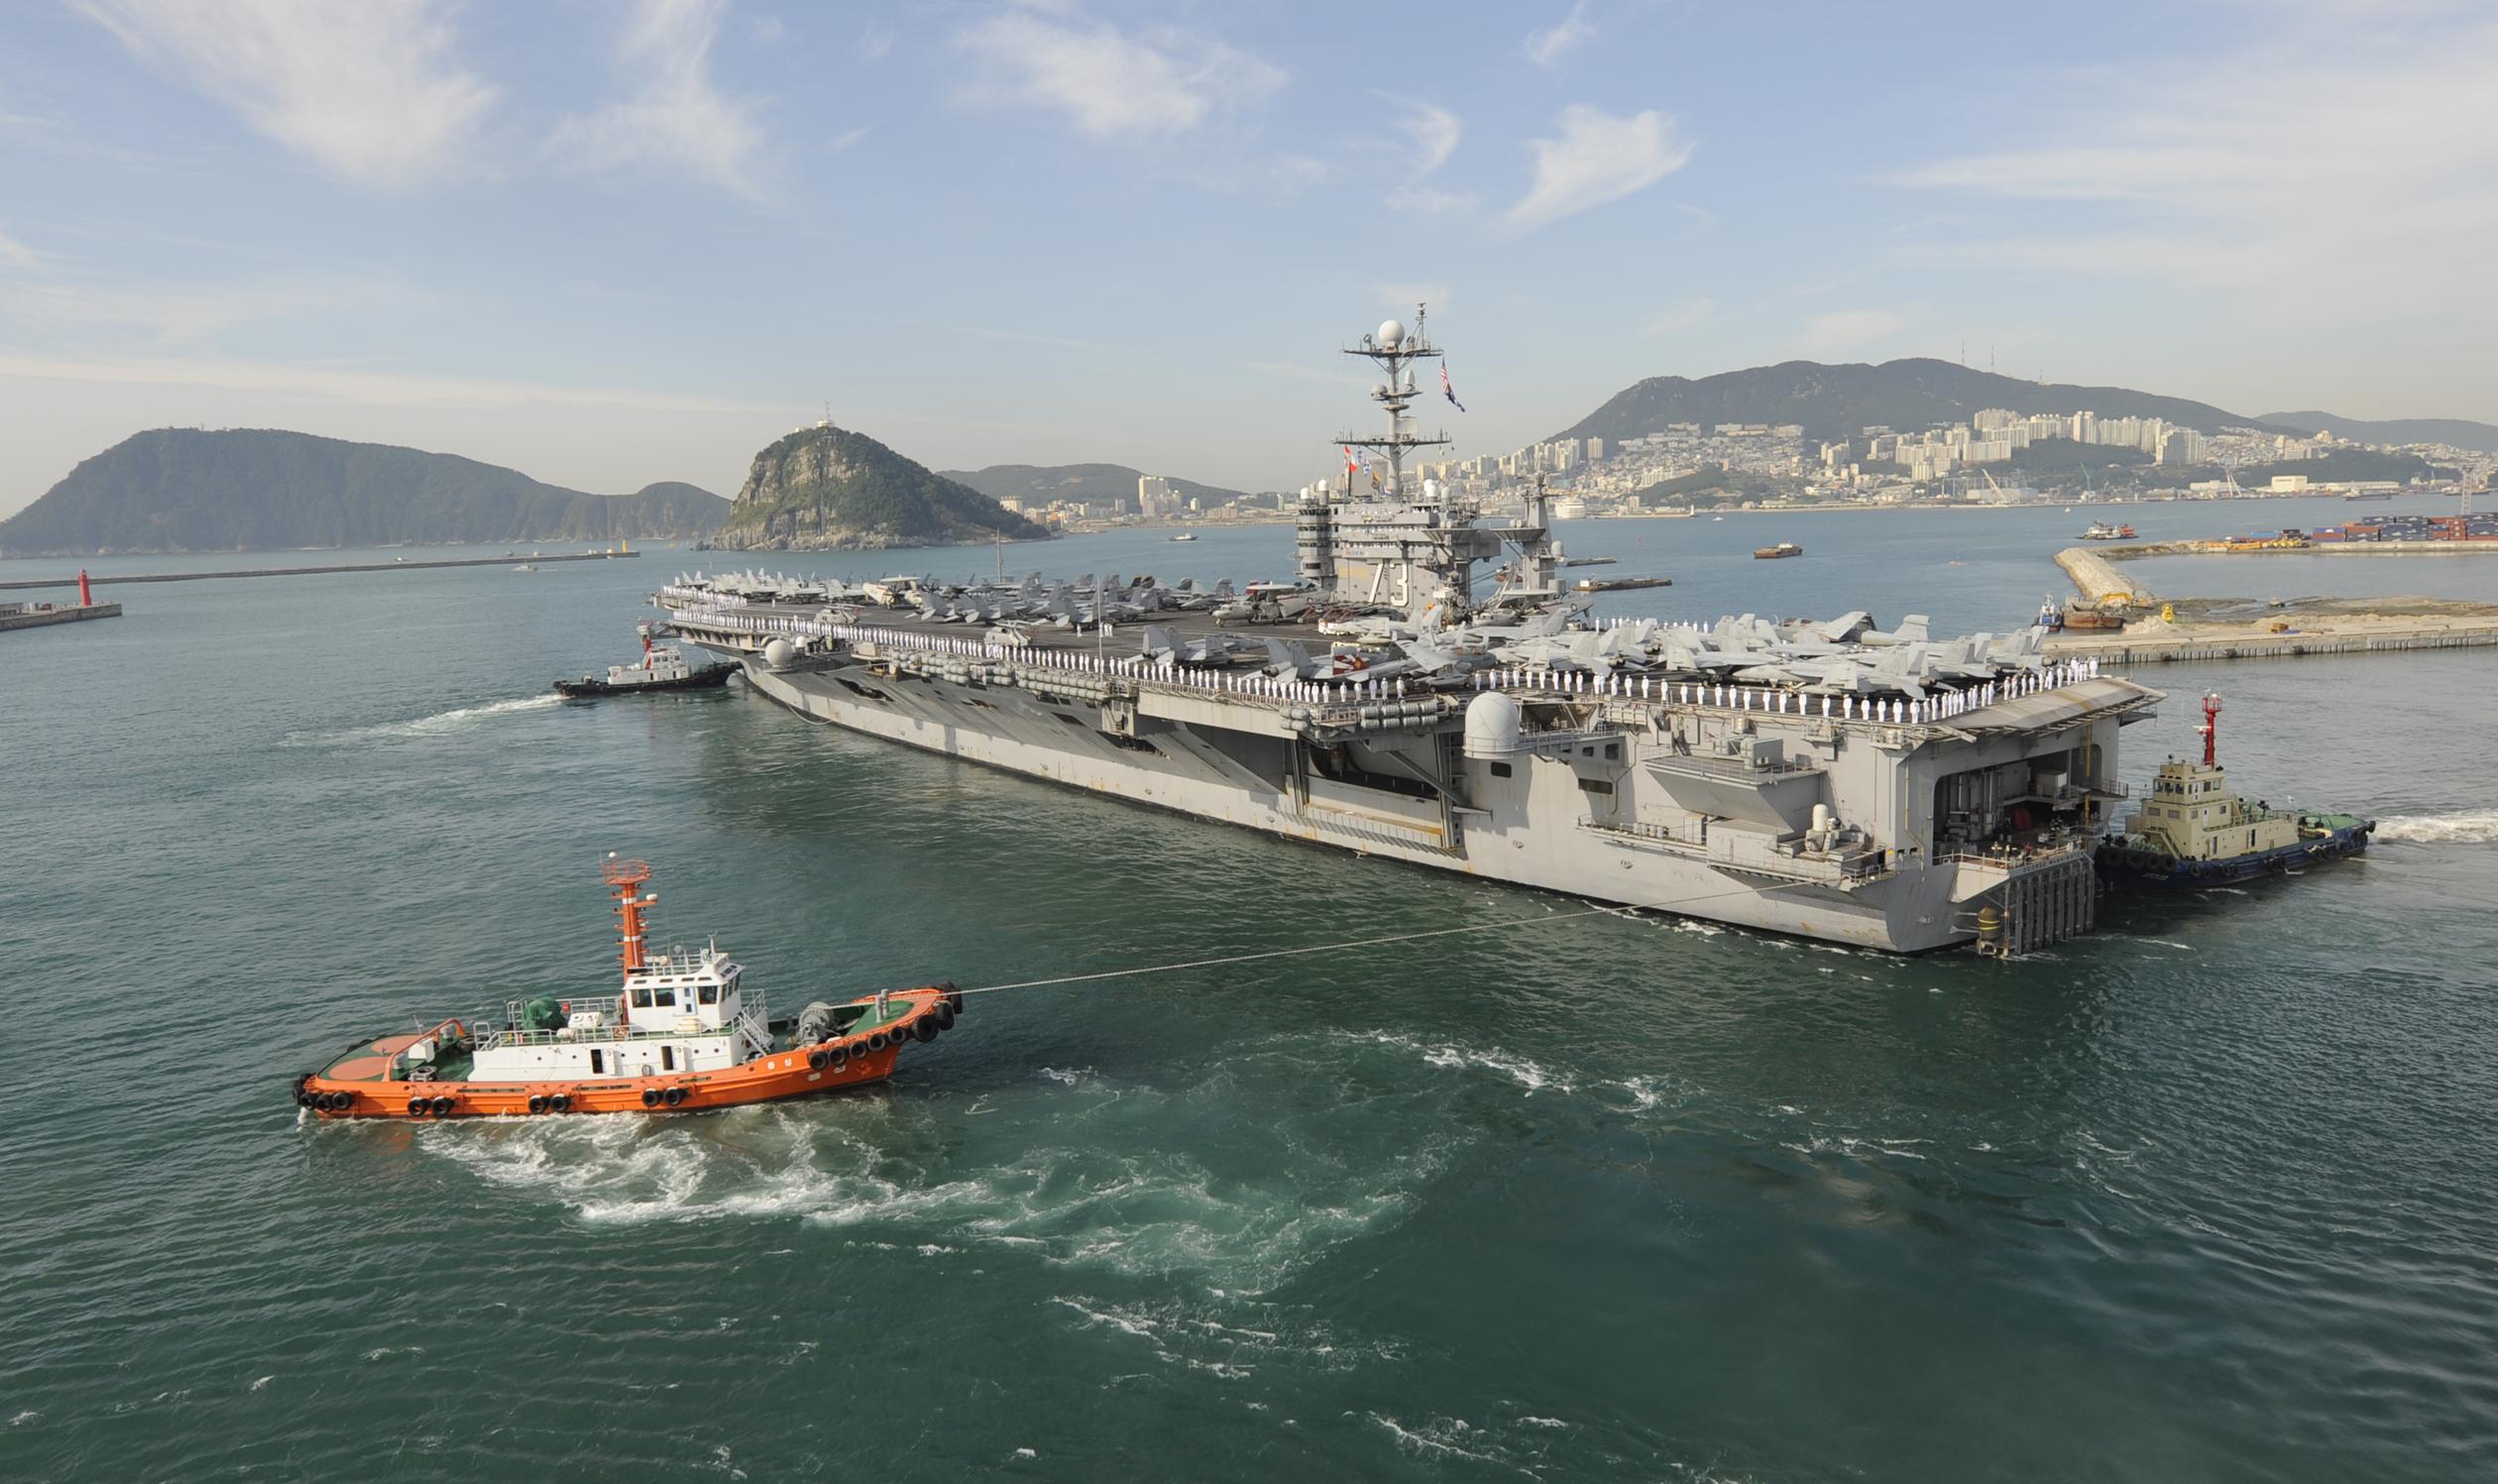 Tugboats assist the aircraft carrier uss george washington cvn 73